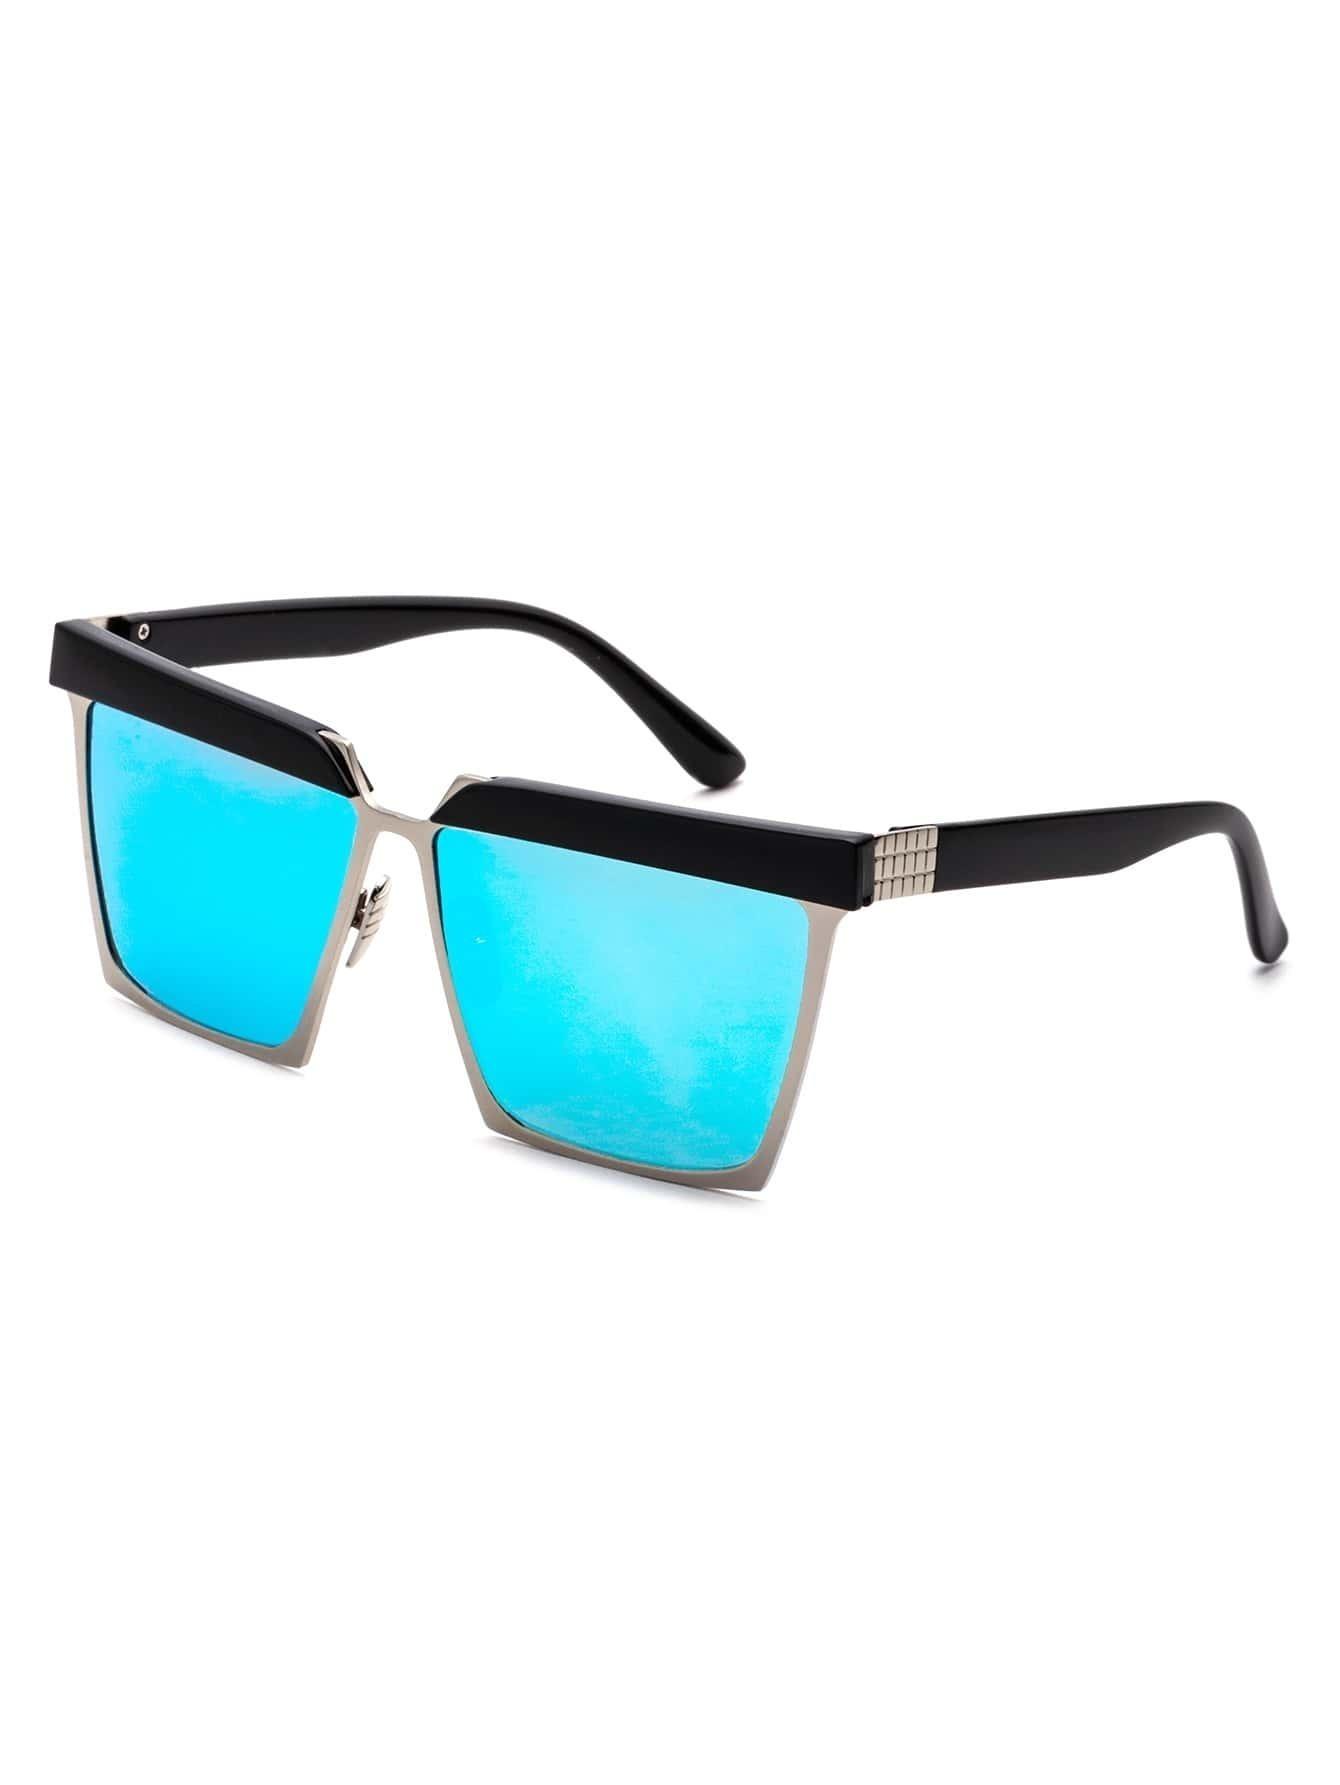 Black Open Frame Blue Lens Sunglasses sunglass161003305